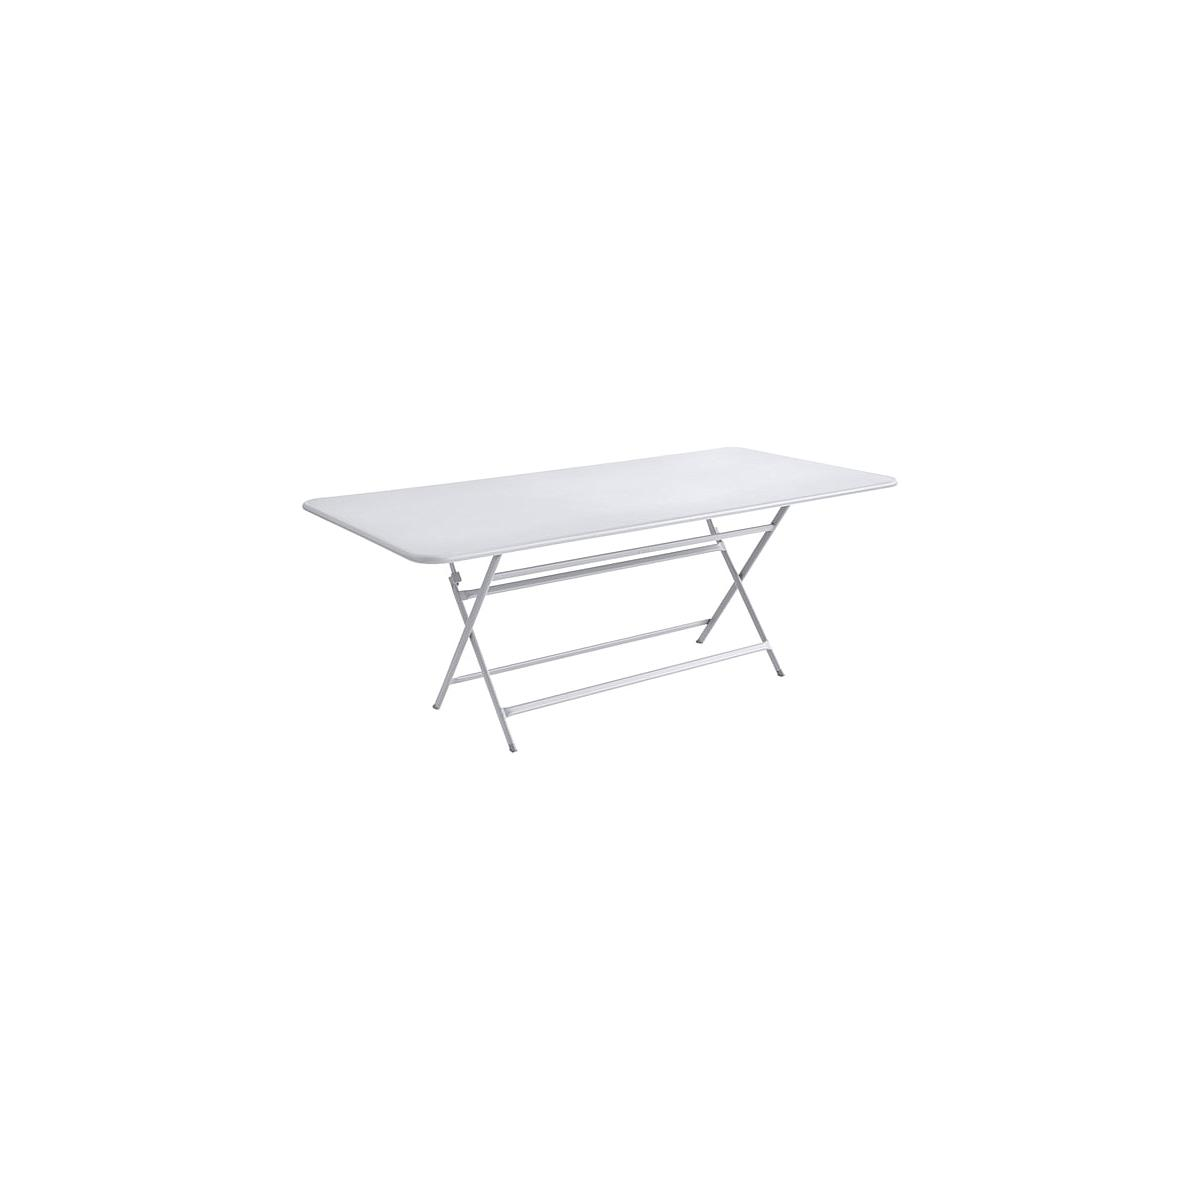 Table 90x190cm pliante CARACTERE Fermob Blanc Coton